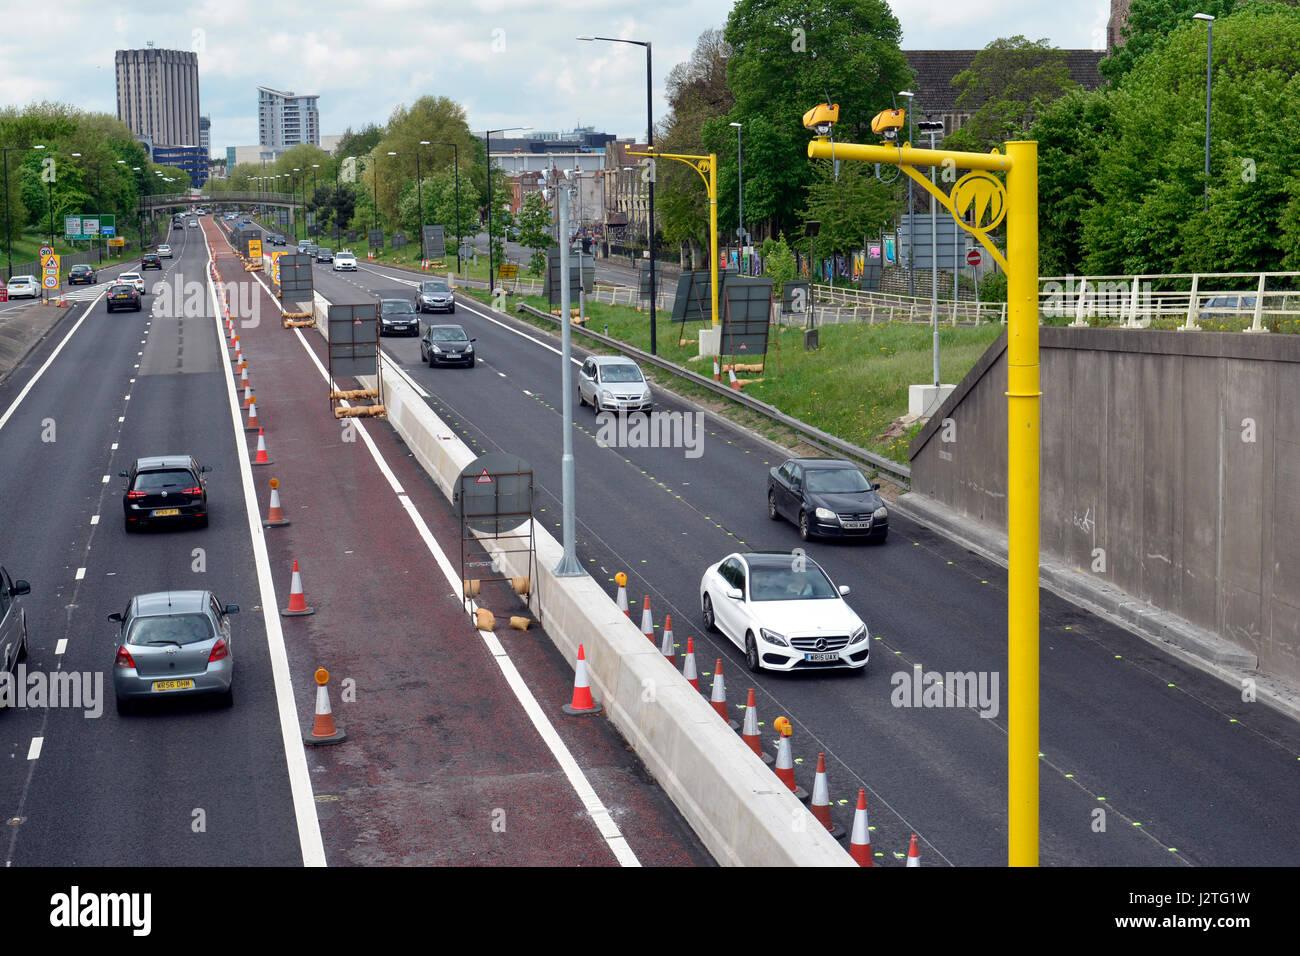 Bristol, UK. 01st May, 2017. M32 Bristol motorway. Newly installed bright yellow average speed cameras have caught Stock Photo